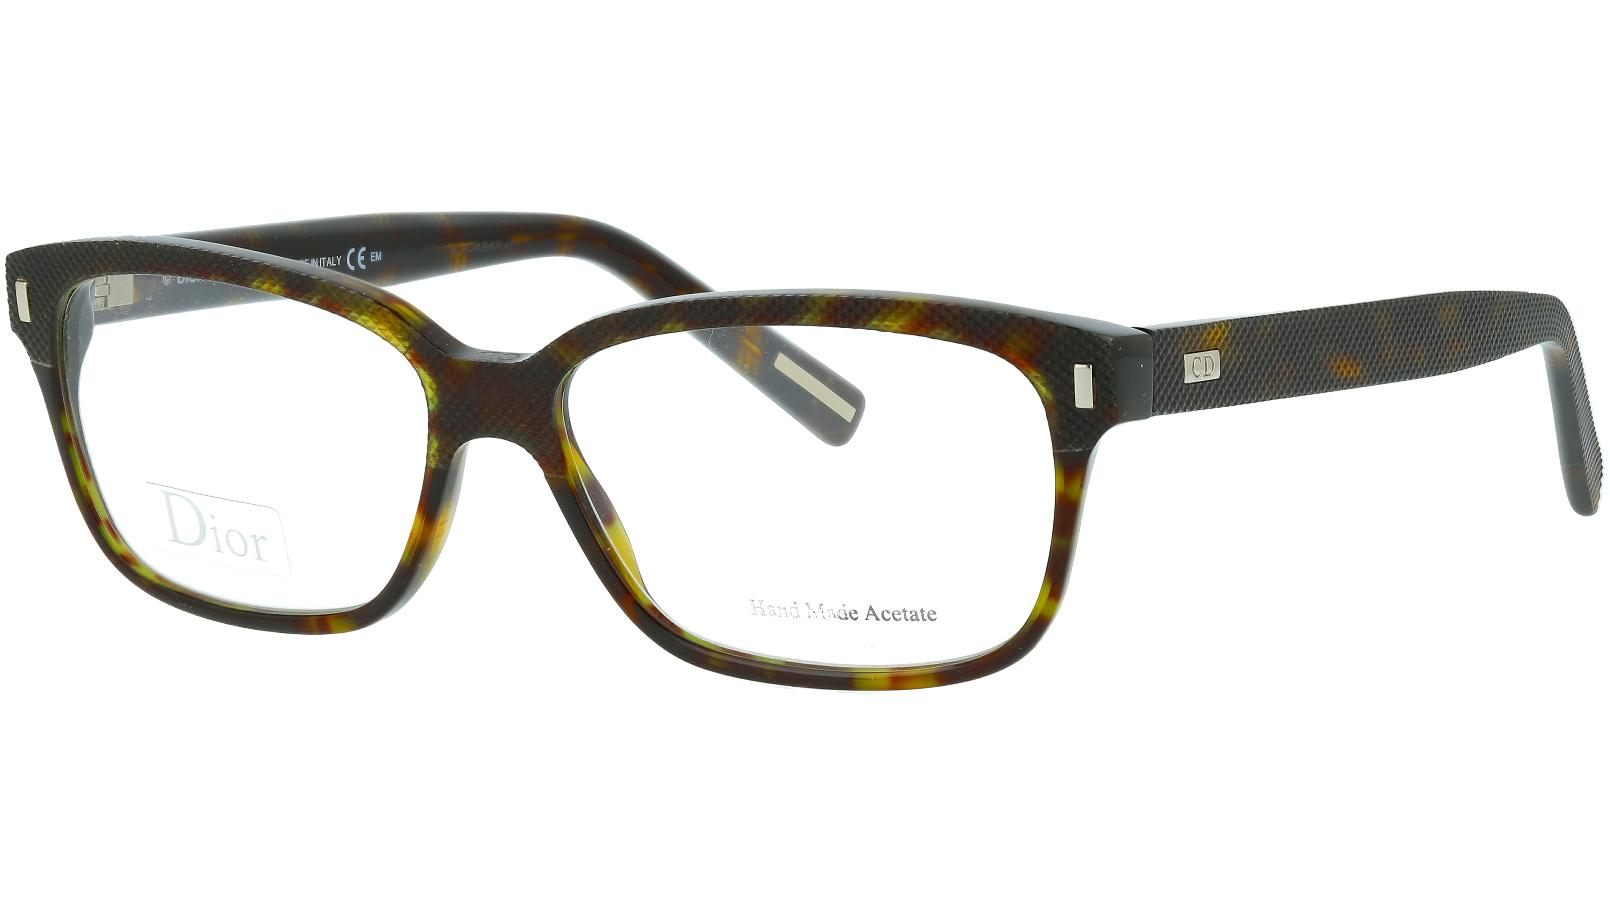 DIOR HOMME BLACKTIE114 086 53 HAVANA Glasses